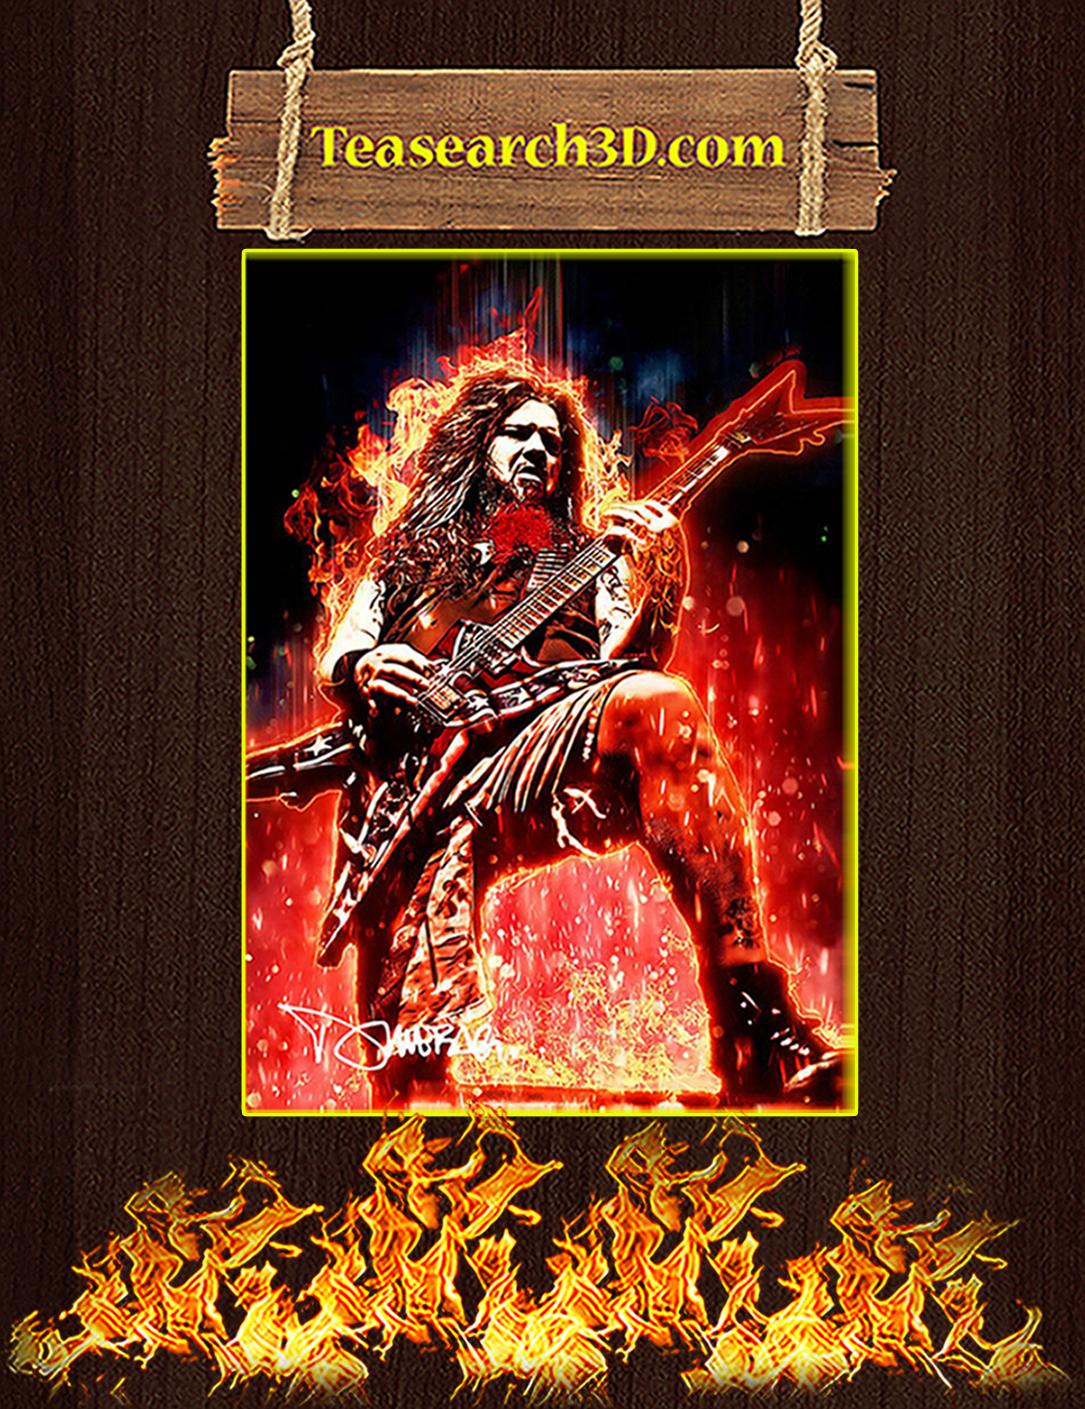 Legendary Dimebag Darrell Signature Poster A2